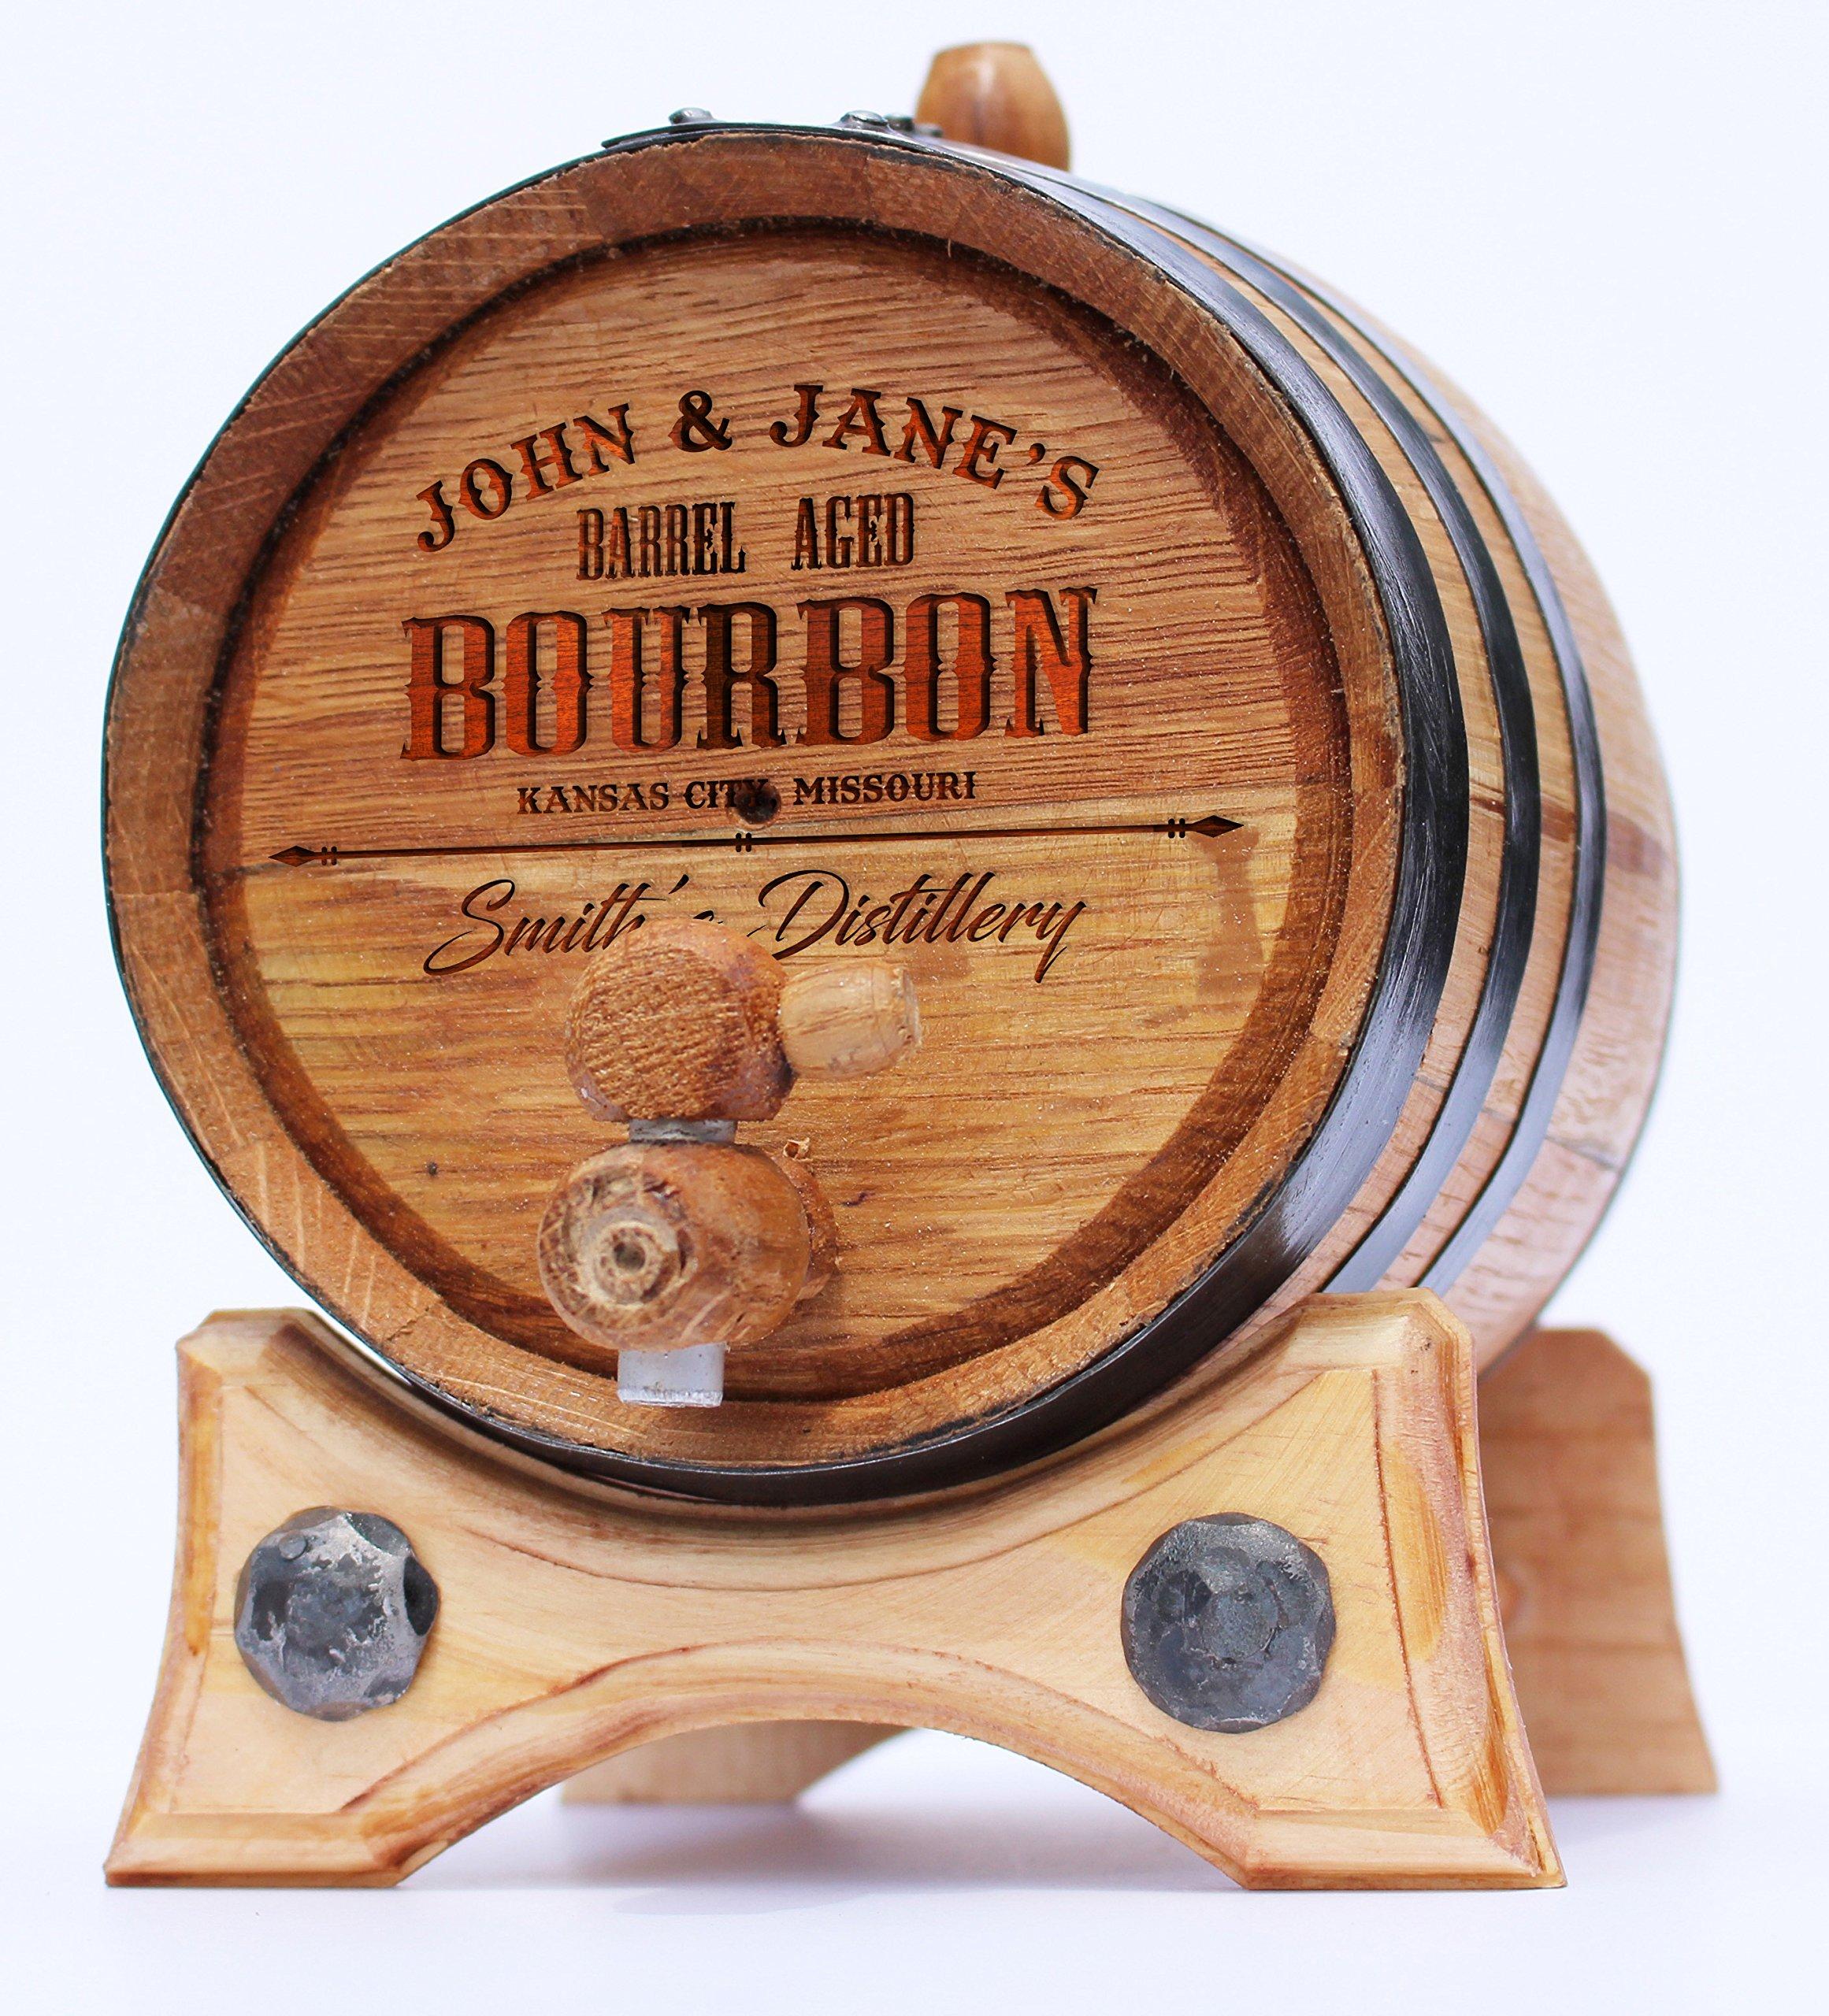 Personalized Whiskey Oak Barrel – 2 Liter Black Steel Hoops - Engraved Bourbon Template